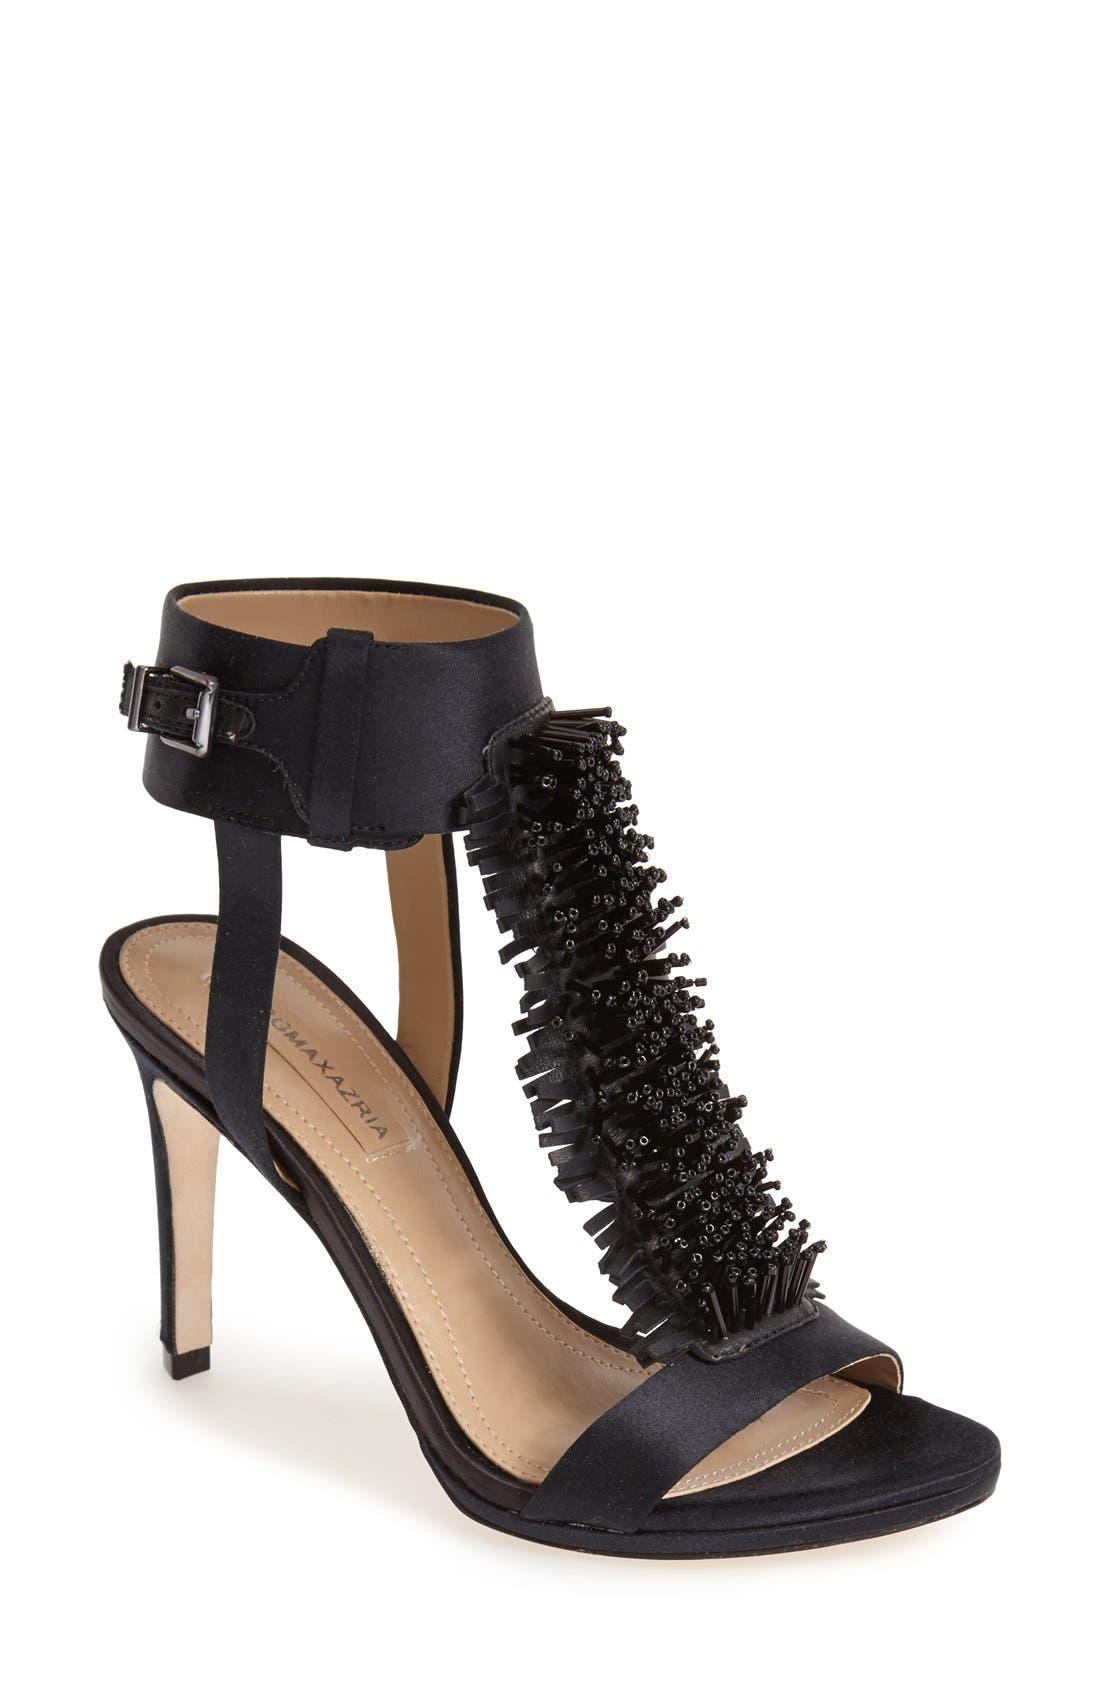 Alternate Image 1 Selected - BCBGMAXAZRIA 'Ma-Limbo' Fringe T-Strap Satin Sandal (Women)